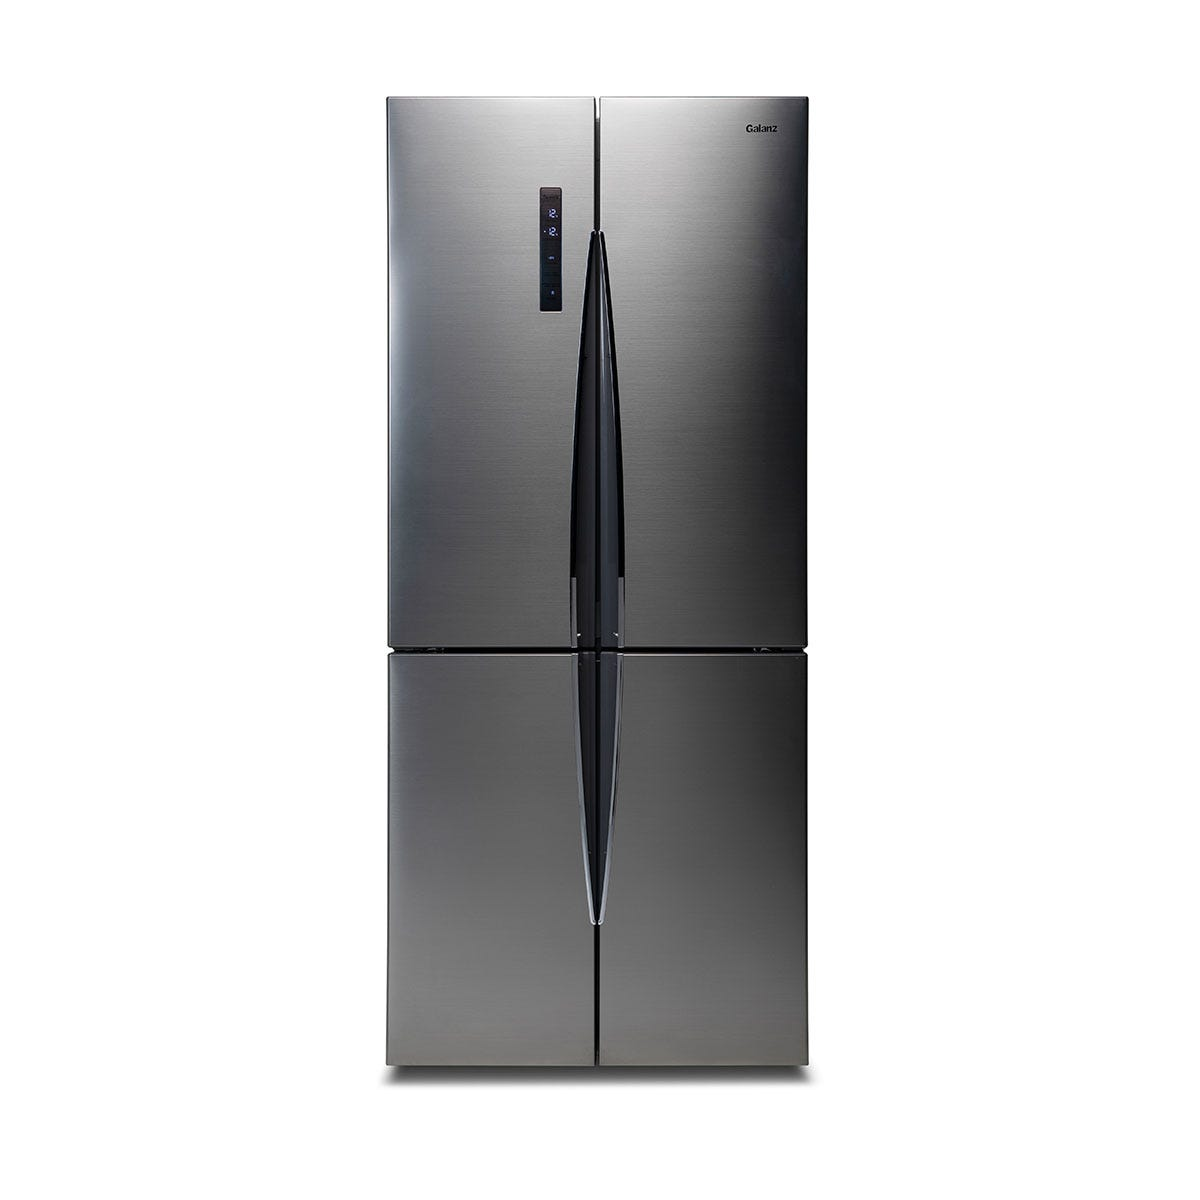 Galanz FFK004G 448L Freestanding American Fridge Freezer - Stainless Steel